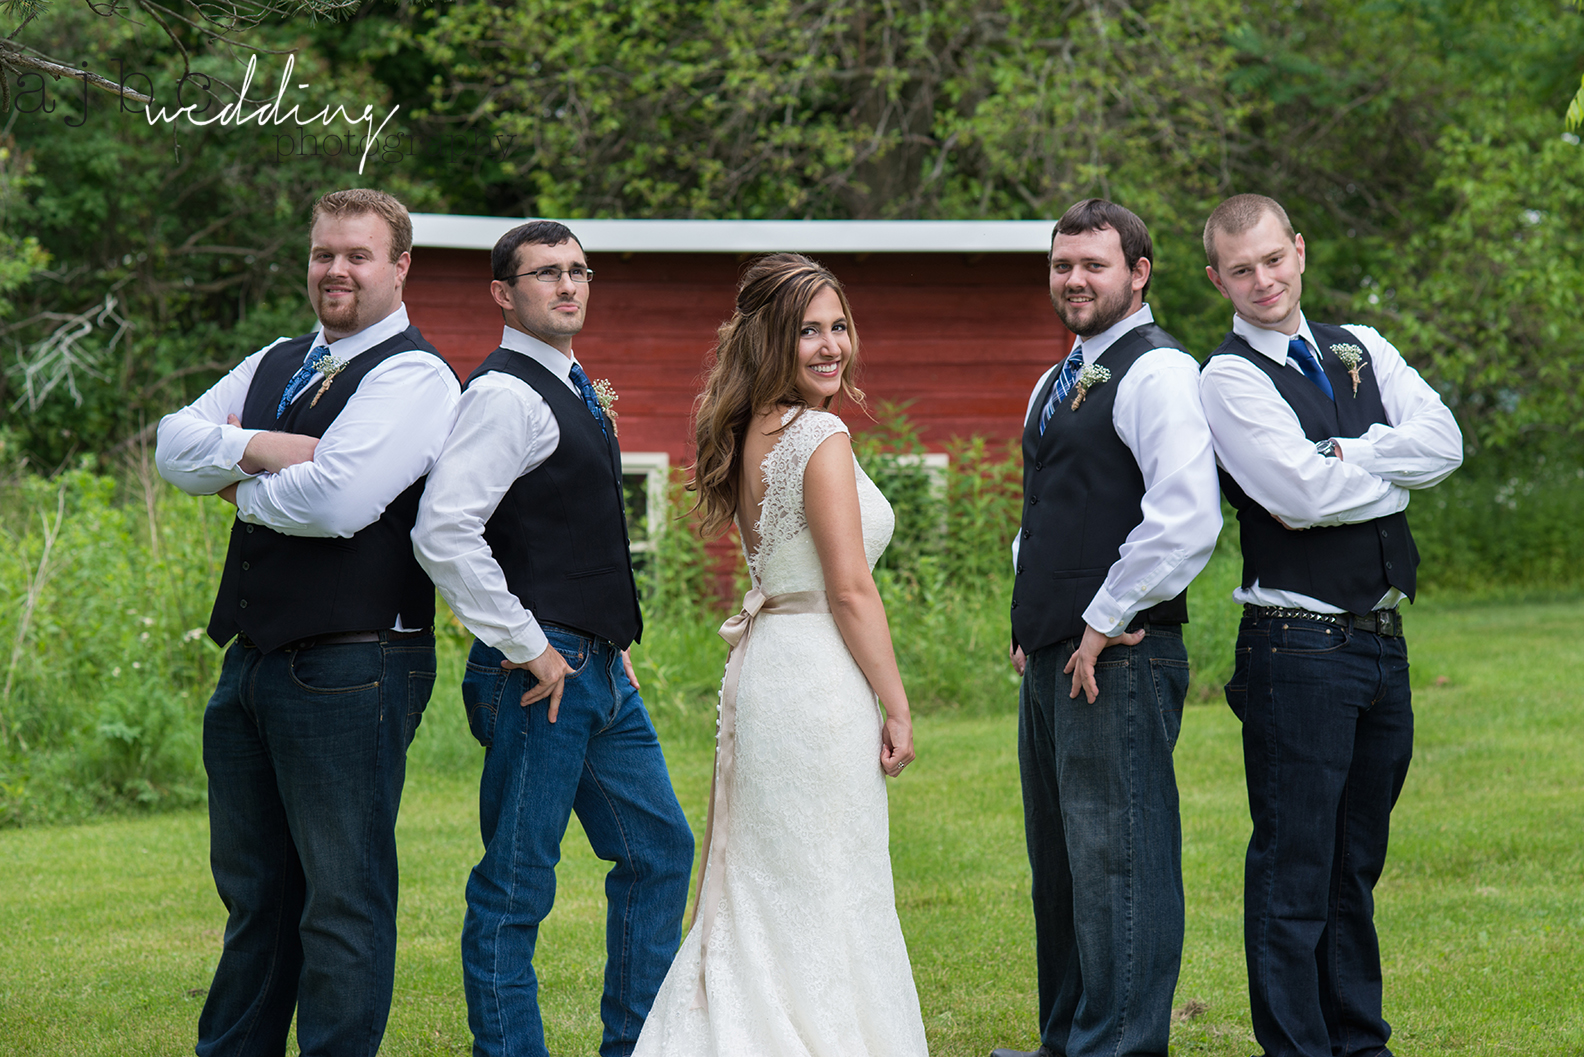 ajbcphotography-port-huron-michigan-wedding-photographer-outdoors-summer-wedding-country-wedding-wadhams-michigan-bride-vintage-wedding-barn-wedding-photographer.jpg